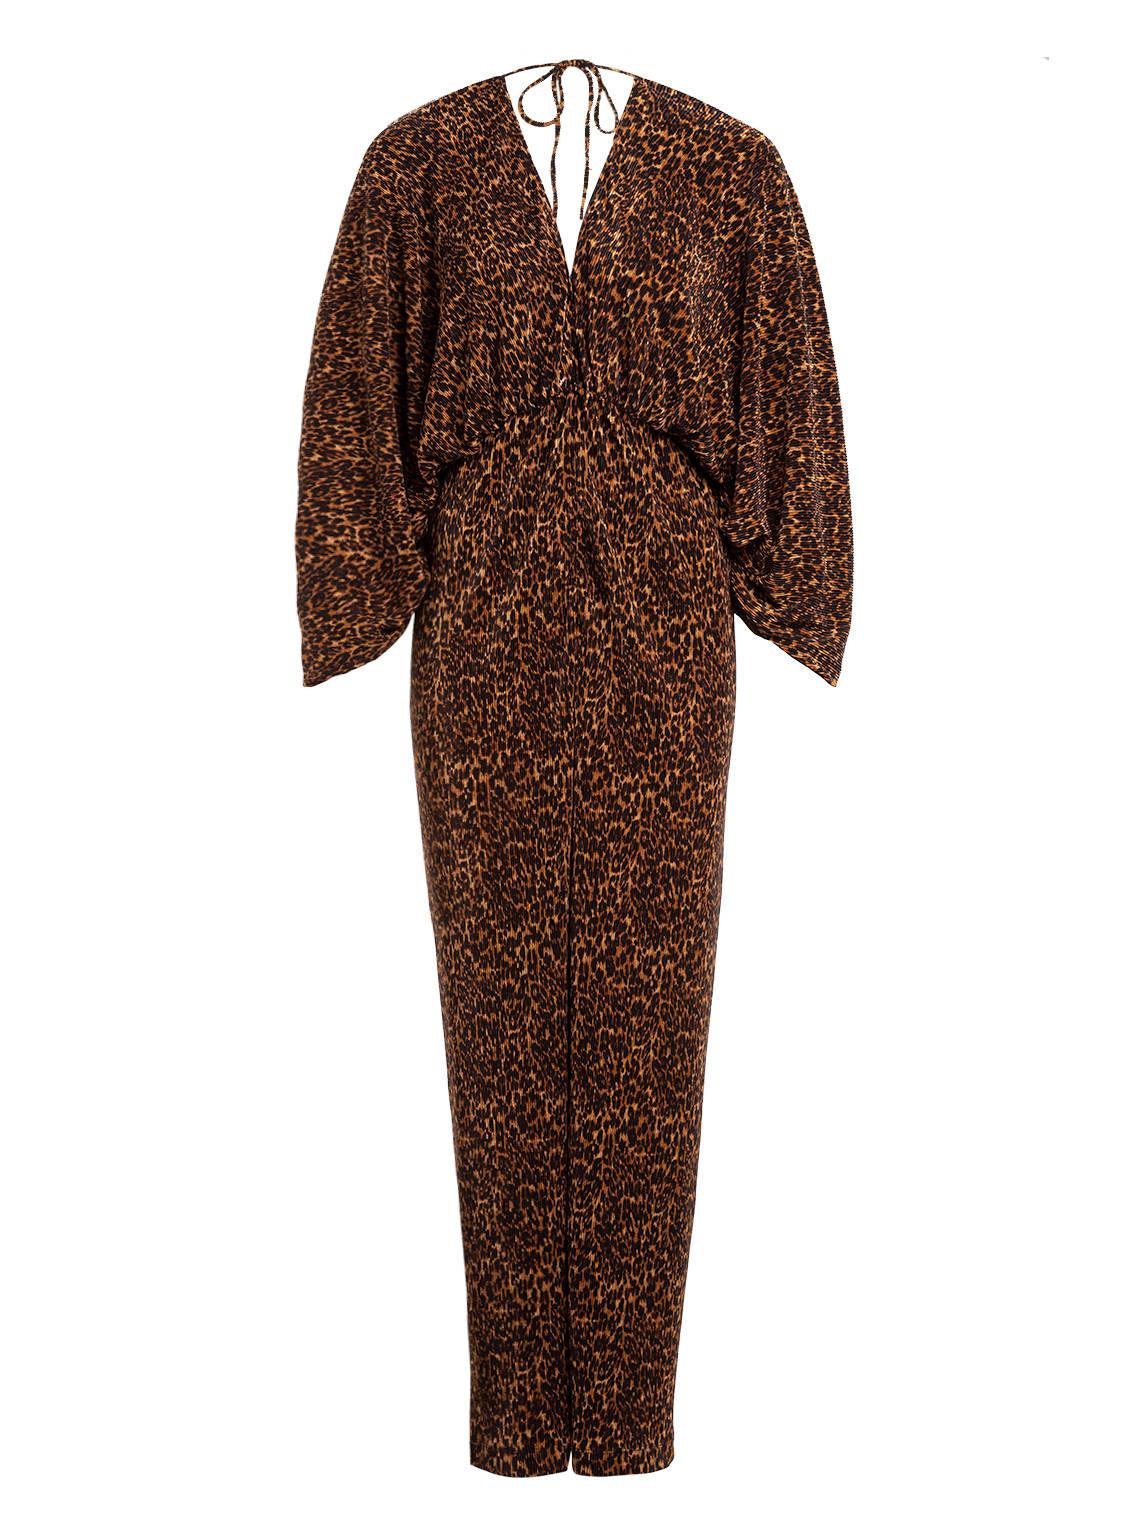 Image of Bardot Jumpsuit Leopard braun